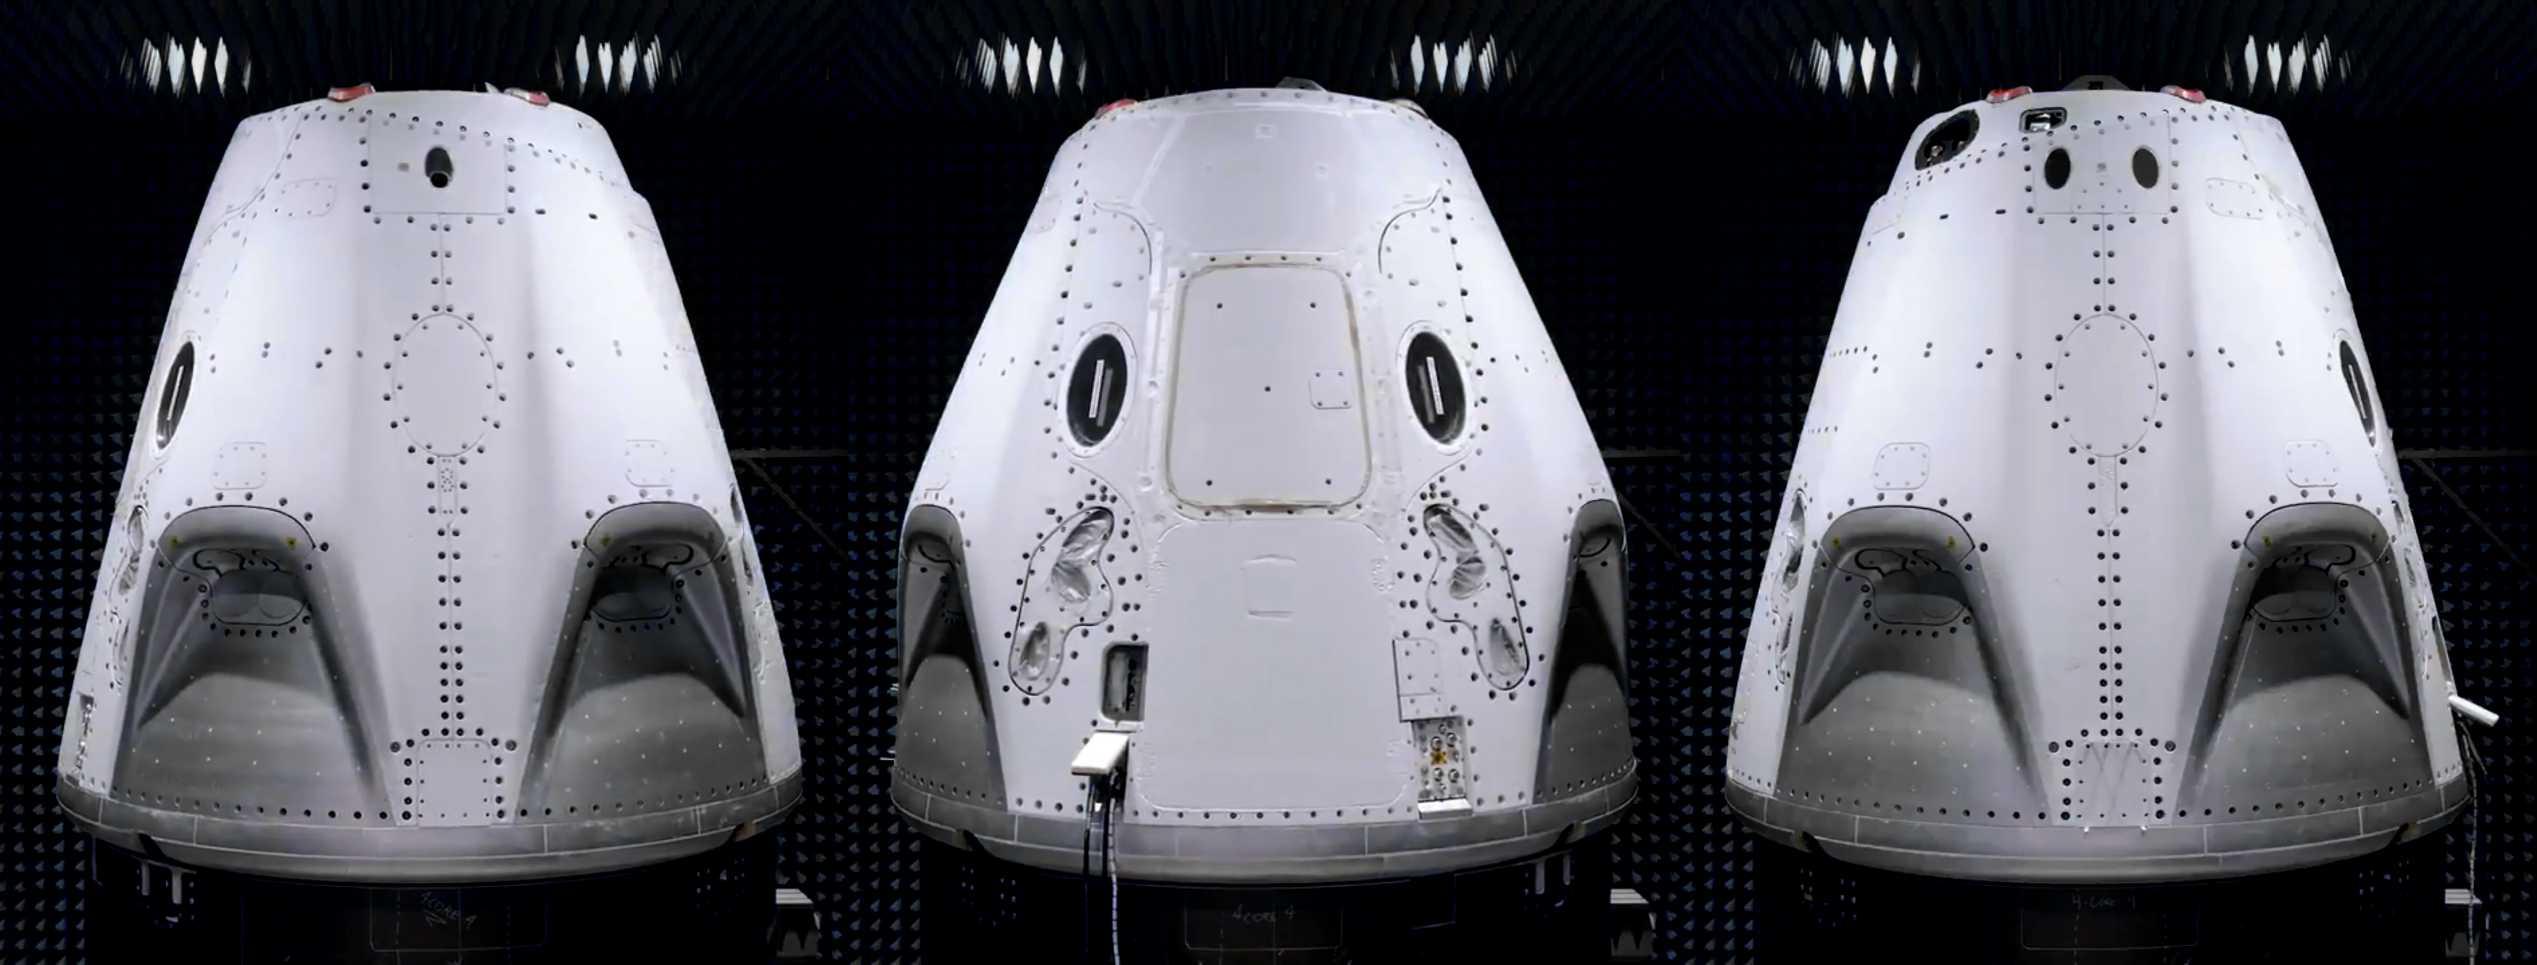 Crew Dragon C206 EMI test Feb 2020 (SpaceX) panel 1 (c)